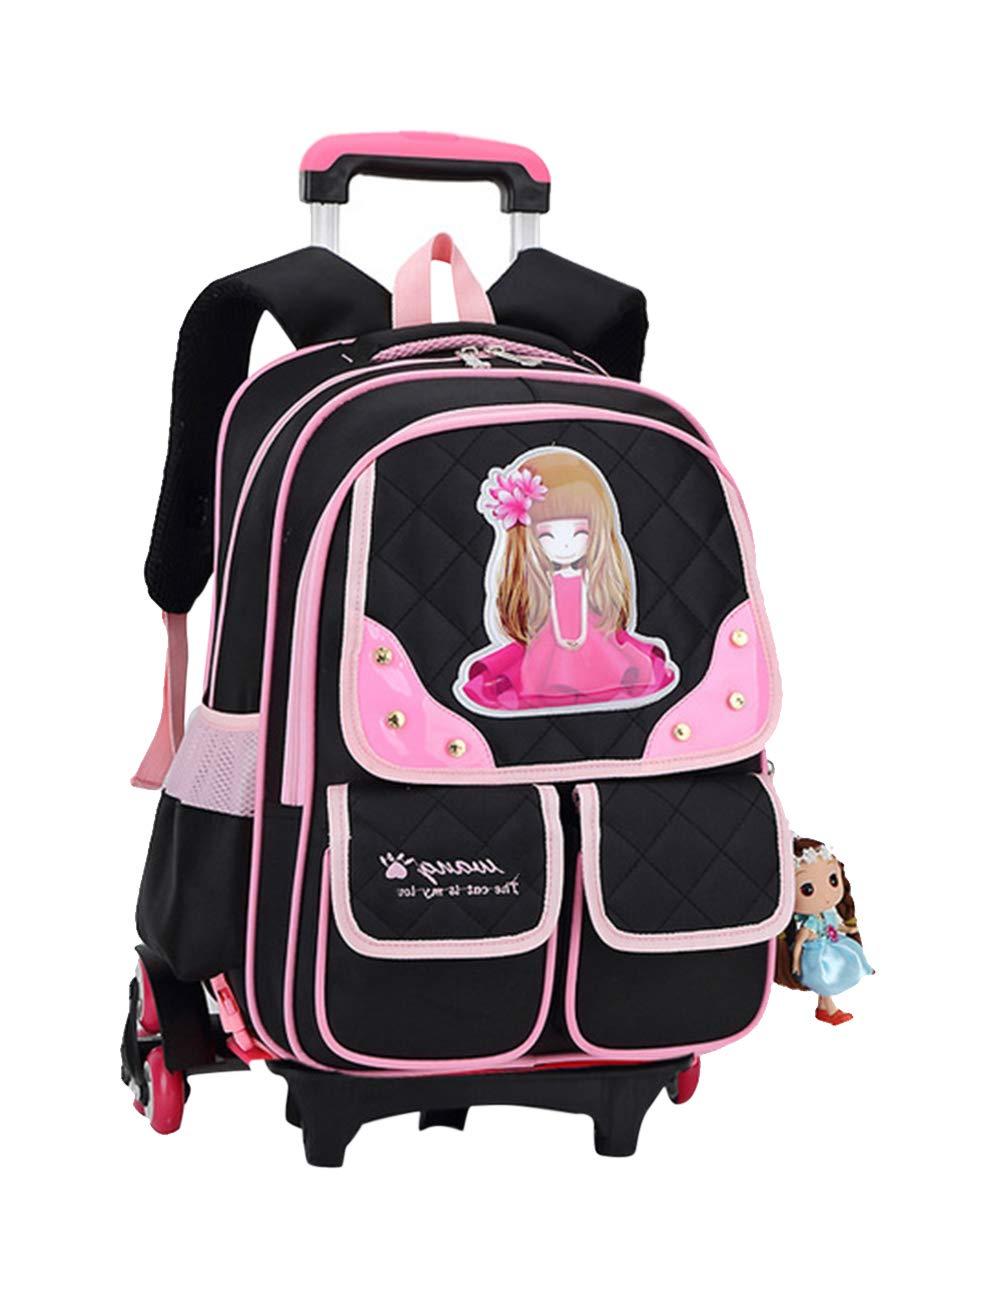 3025  Black One_Size Backpack Shoulder Bag Trolley School Bag Travel Bag Rucksack Kid Teenager Zhhmeiruian